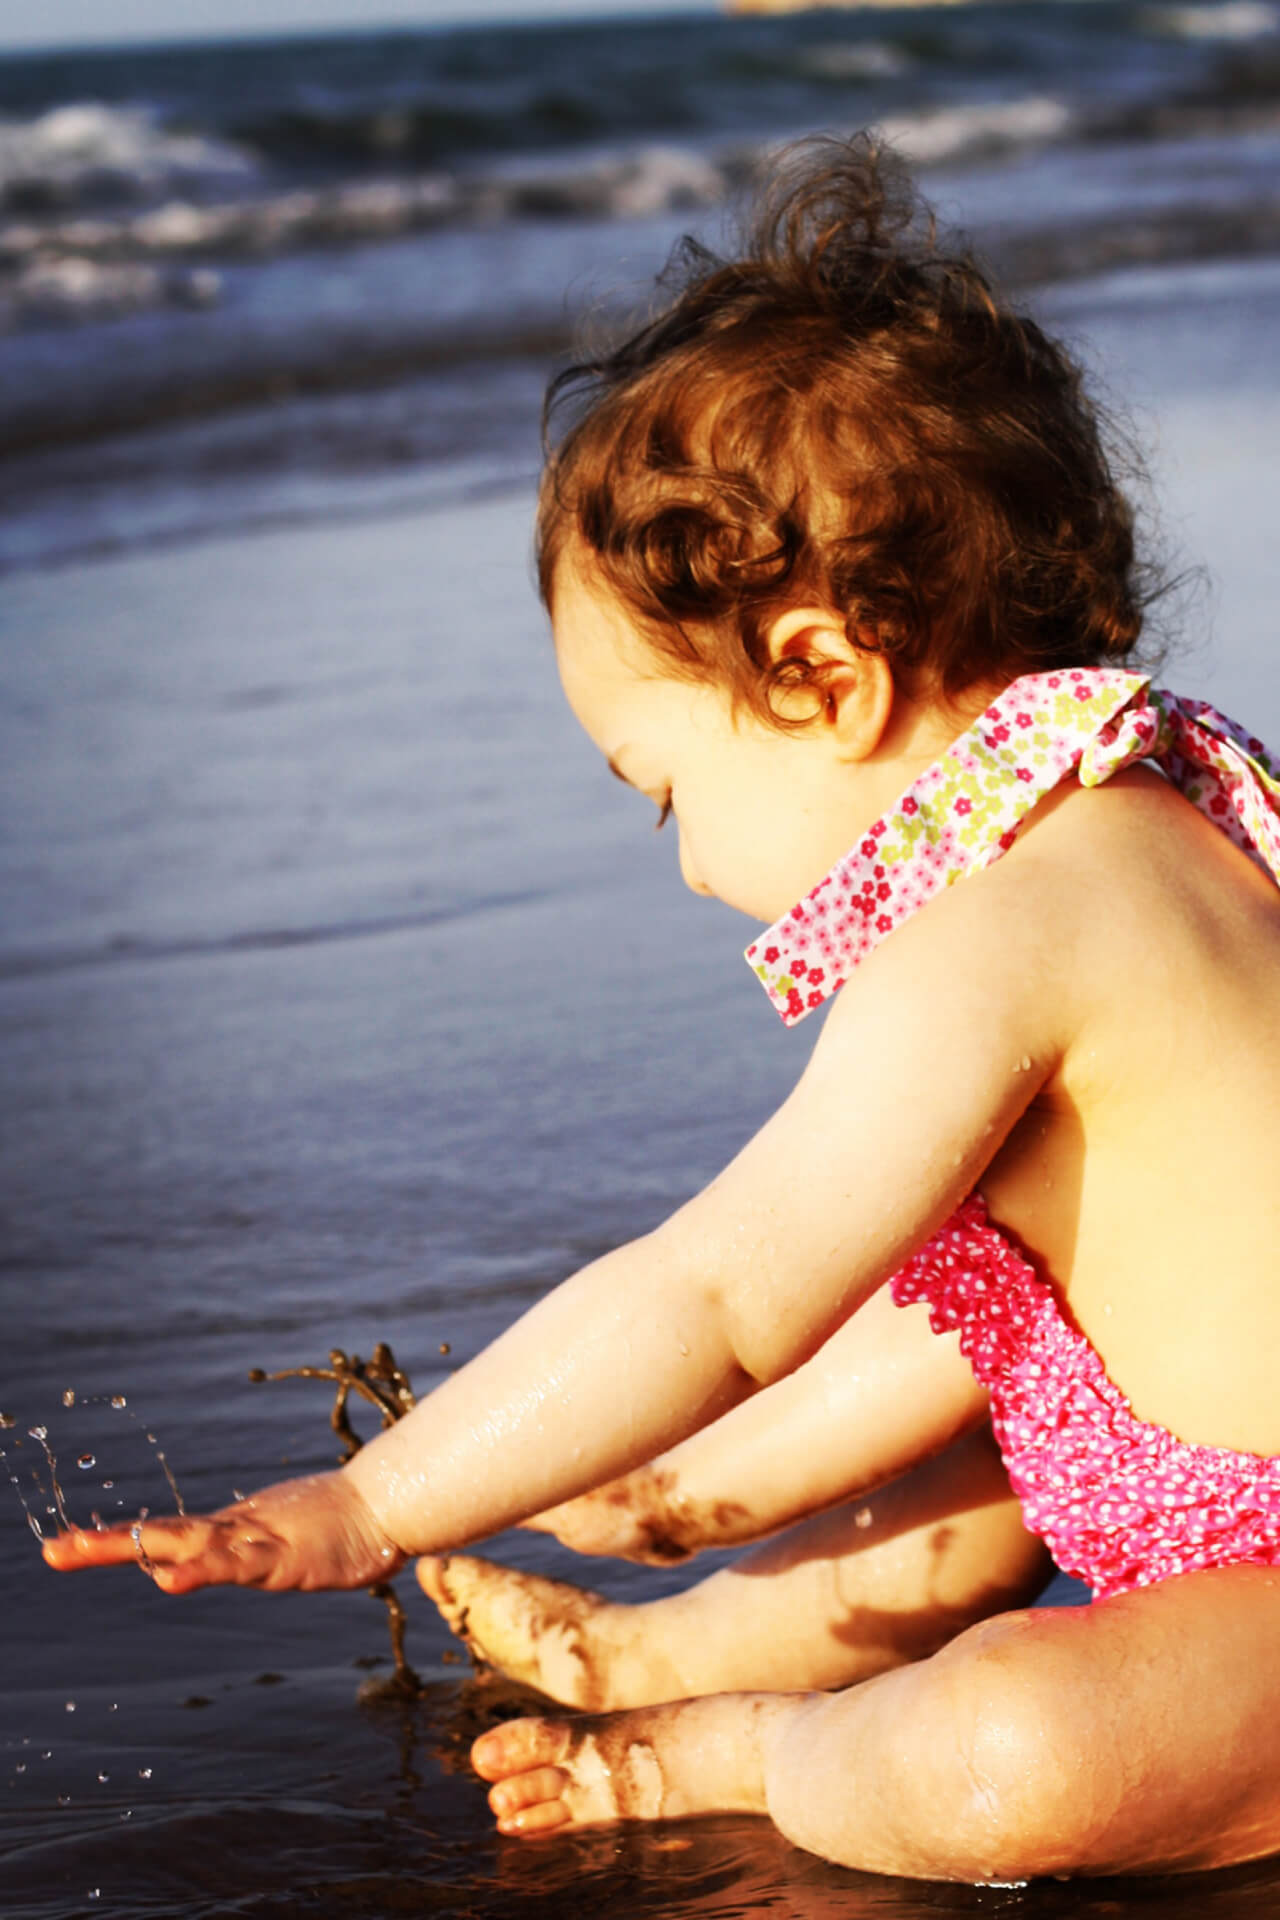 Bebé a brincar na praia, a chapinhar na água.